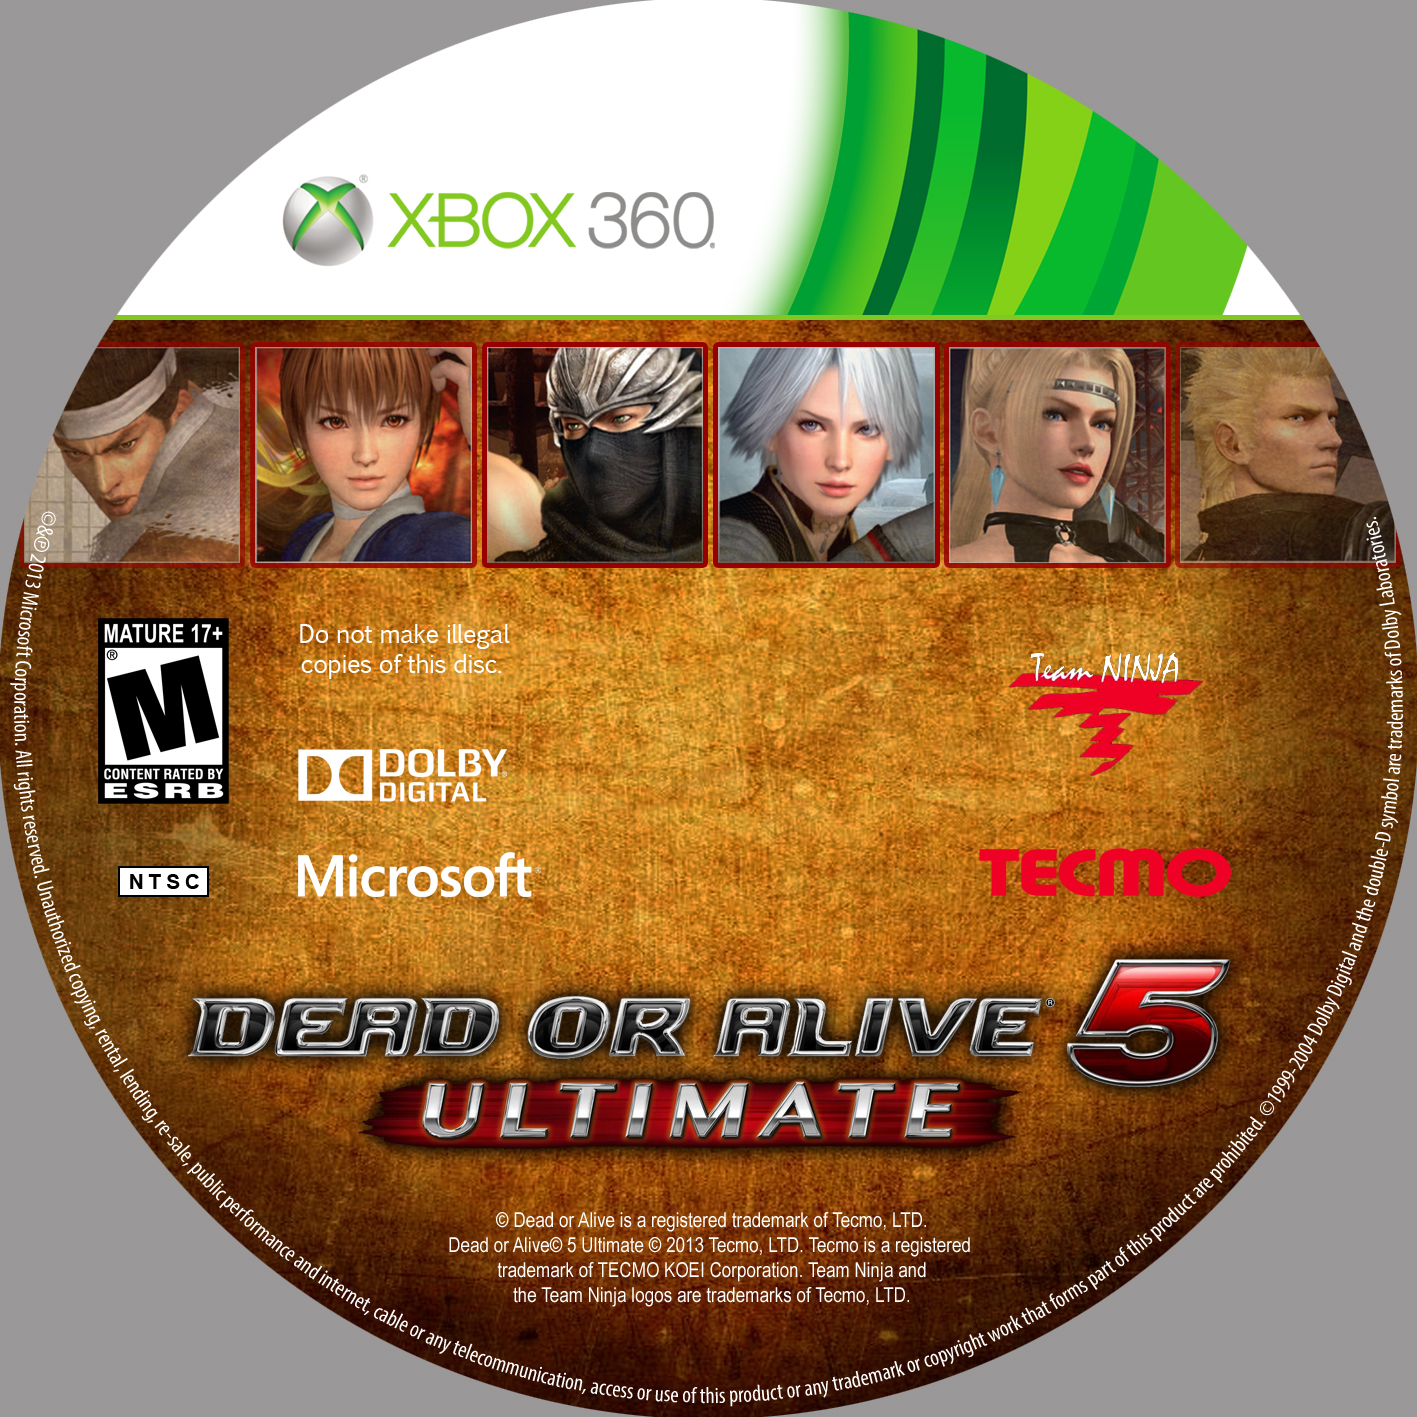 Dead or Alive 5 Ultimate CD.jpg